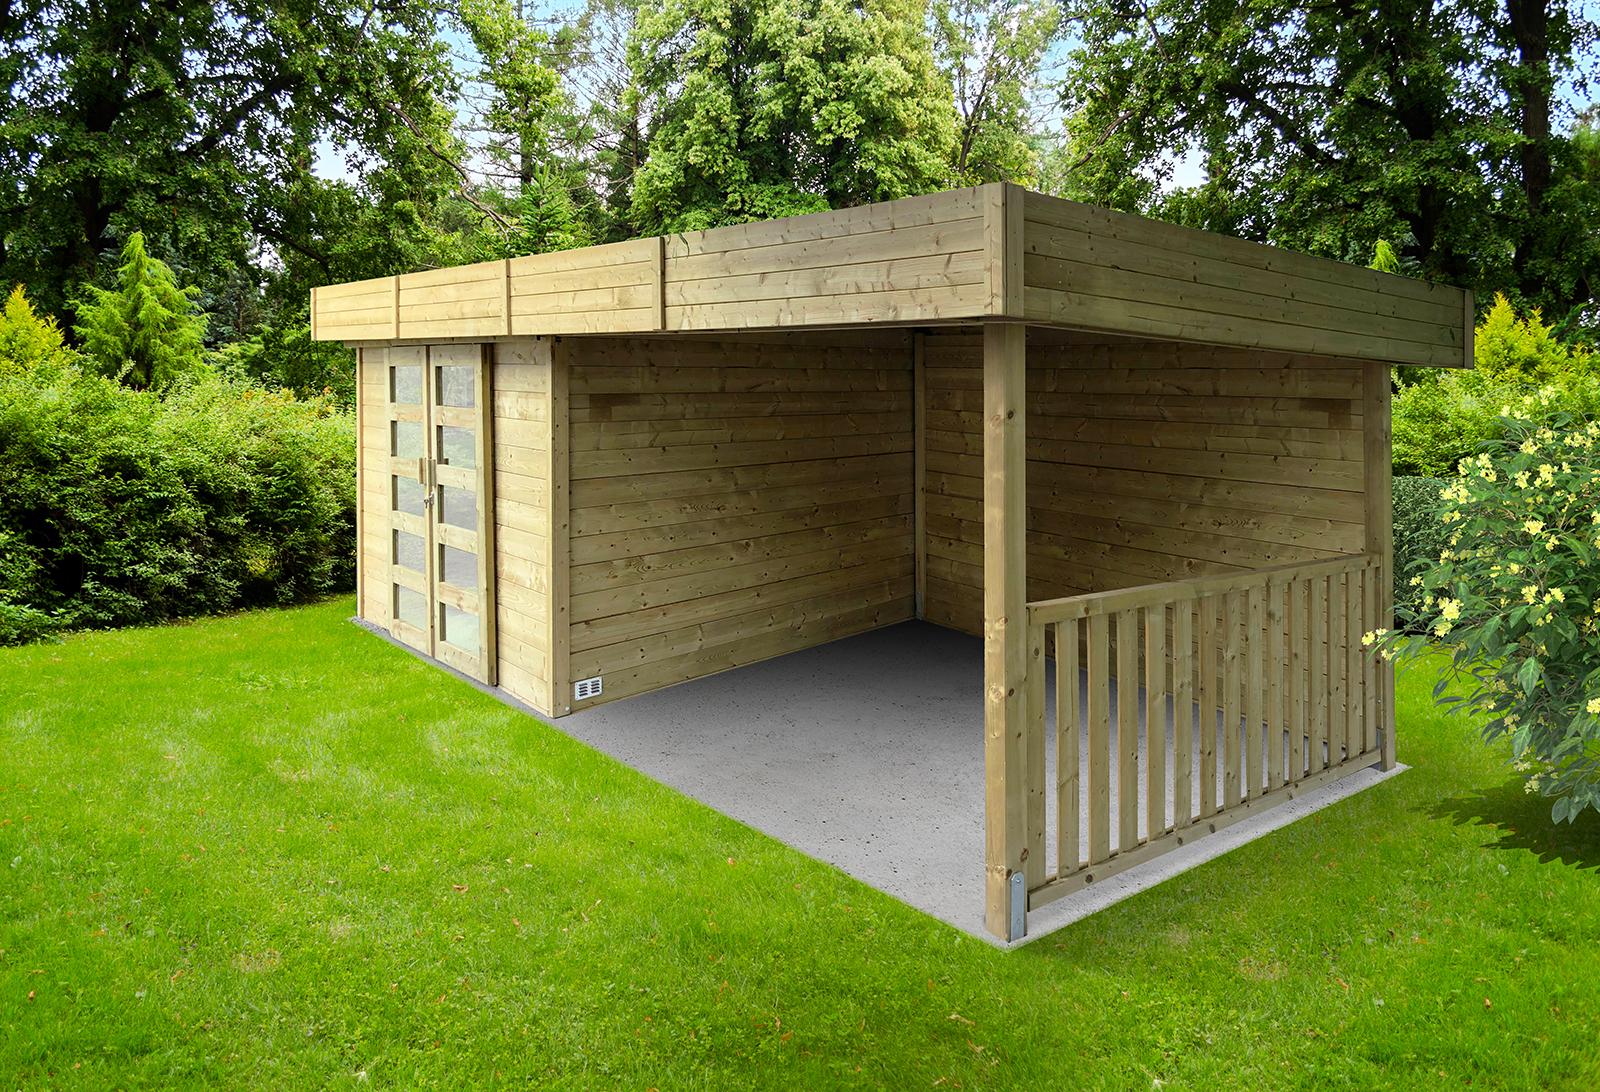 Abri De Jardin Moderne Arhus 28 Mm 3,3 + 3,17 X 2,45 M Solid - Mr.bricolage serapportantà Abri De Jardin Bois Monsieur Bricolage